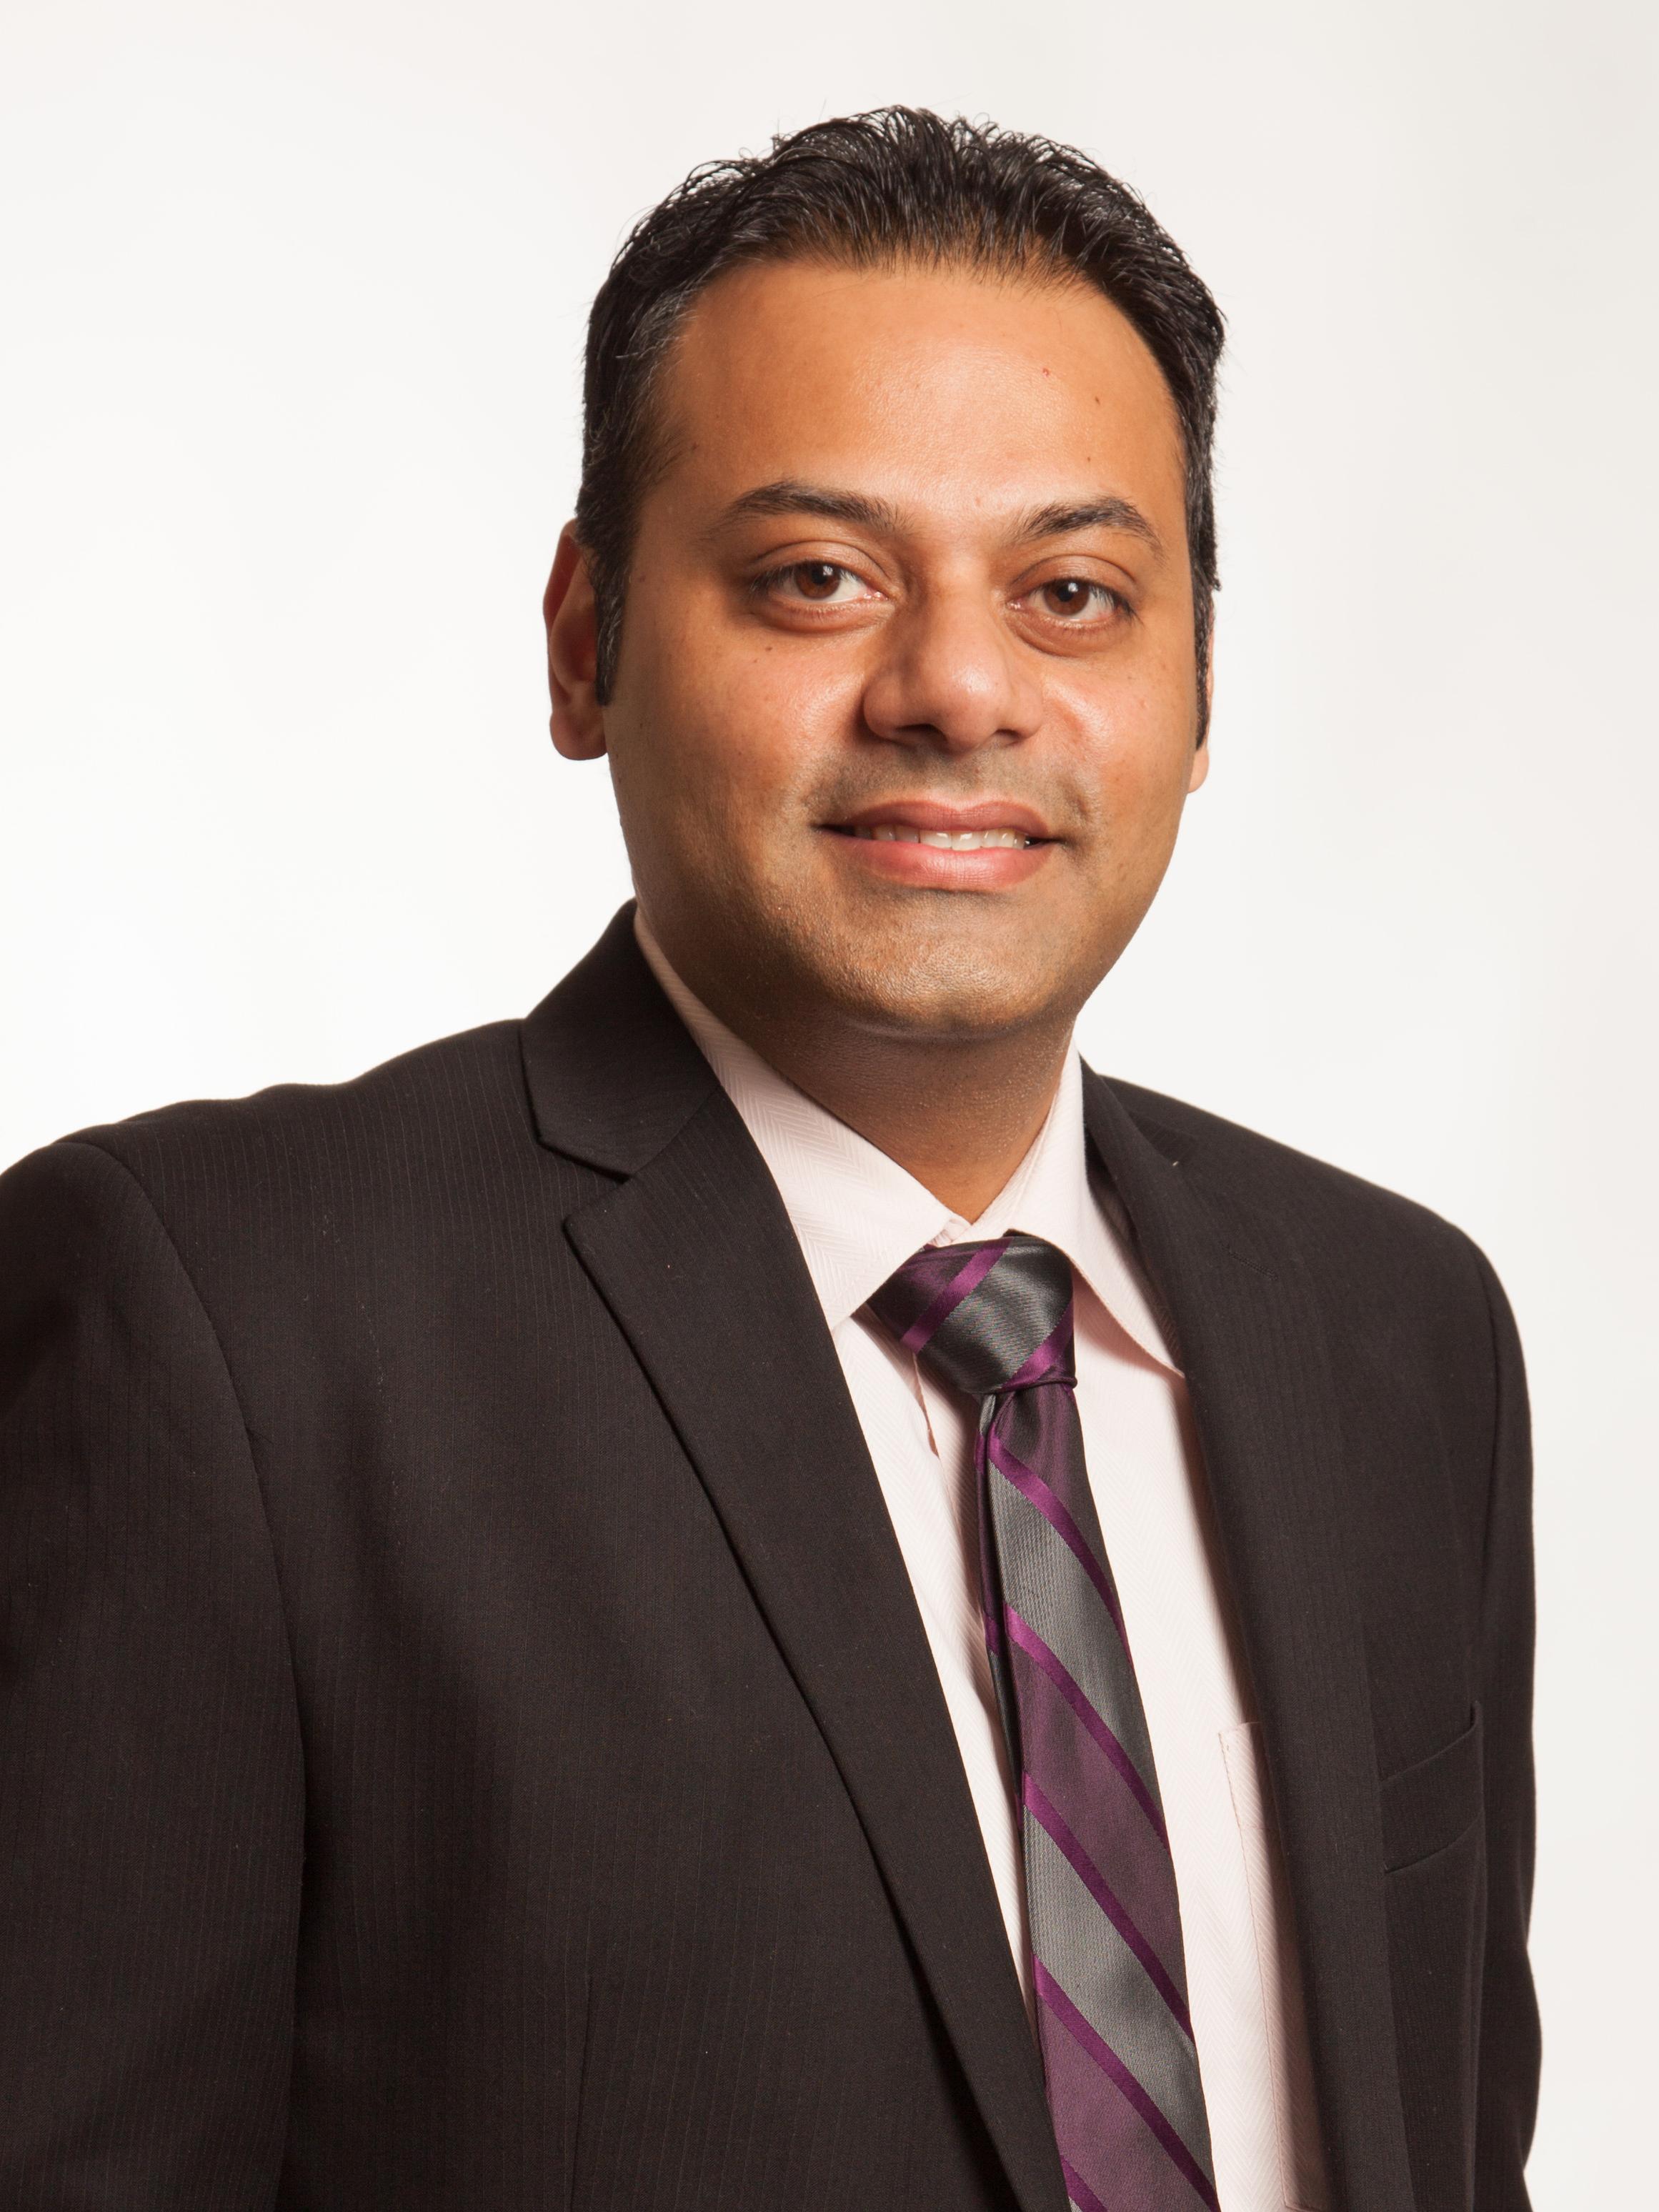 Nikhil Bajaj